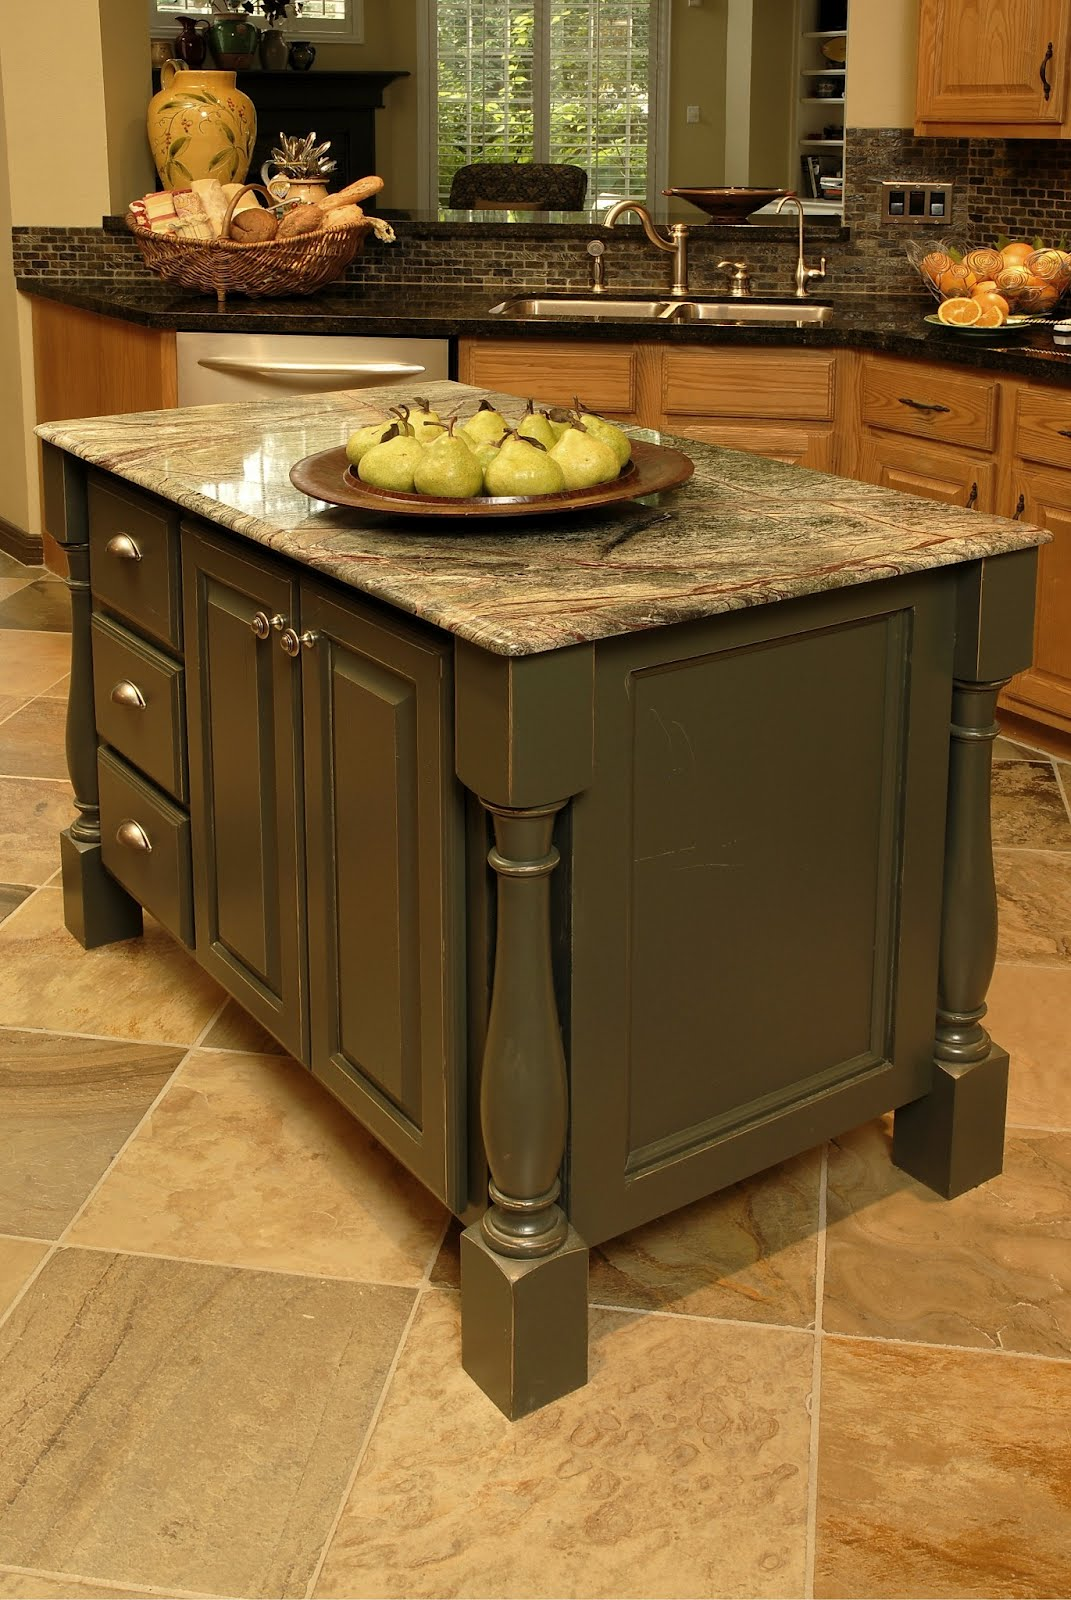 New kitchen island designed by   Carla Aston #kitchenisland #kitchenremodelingideas